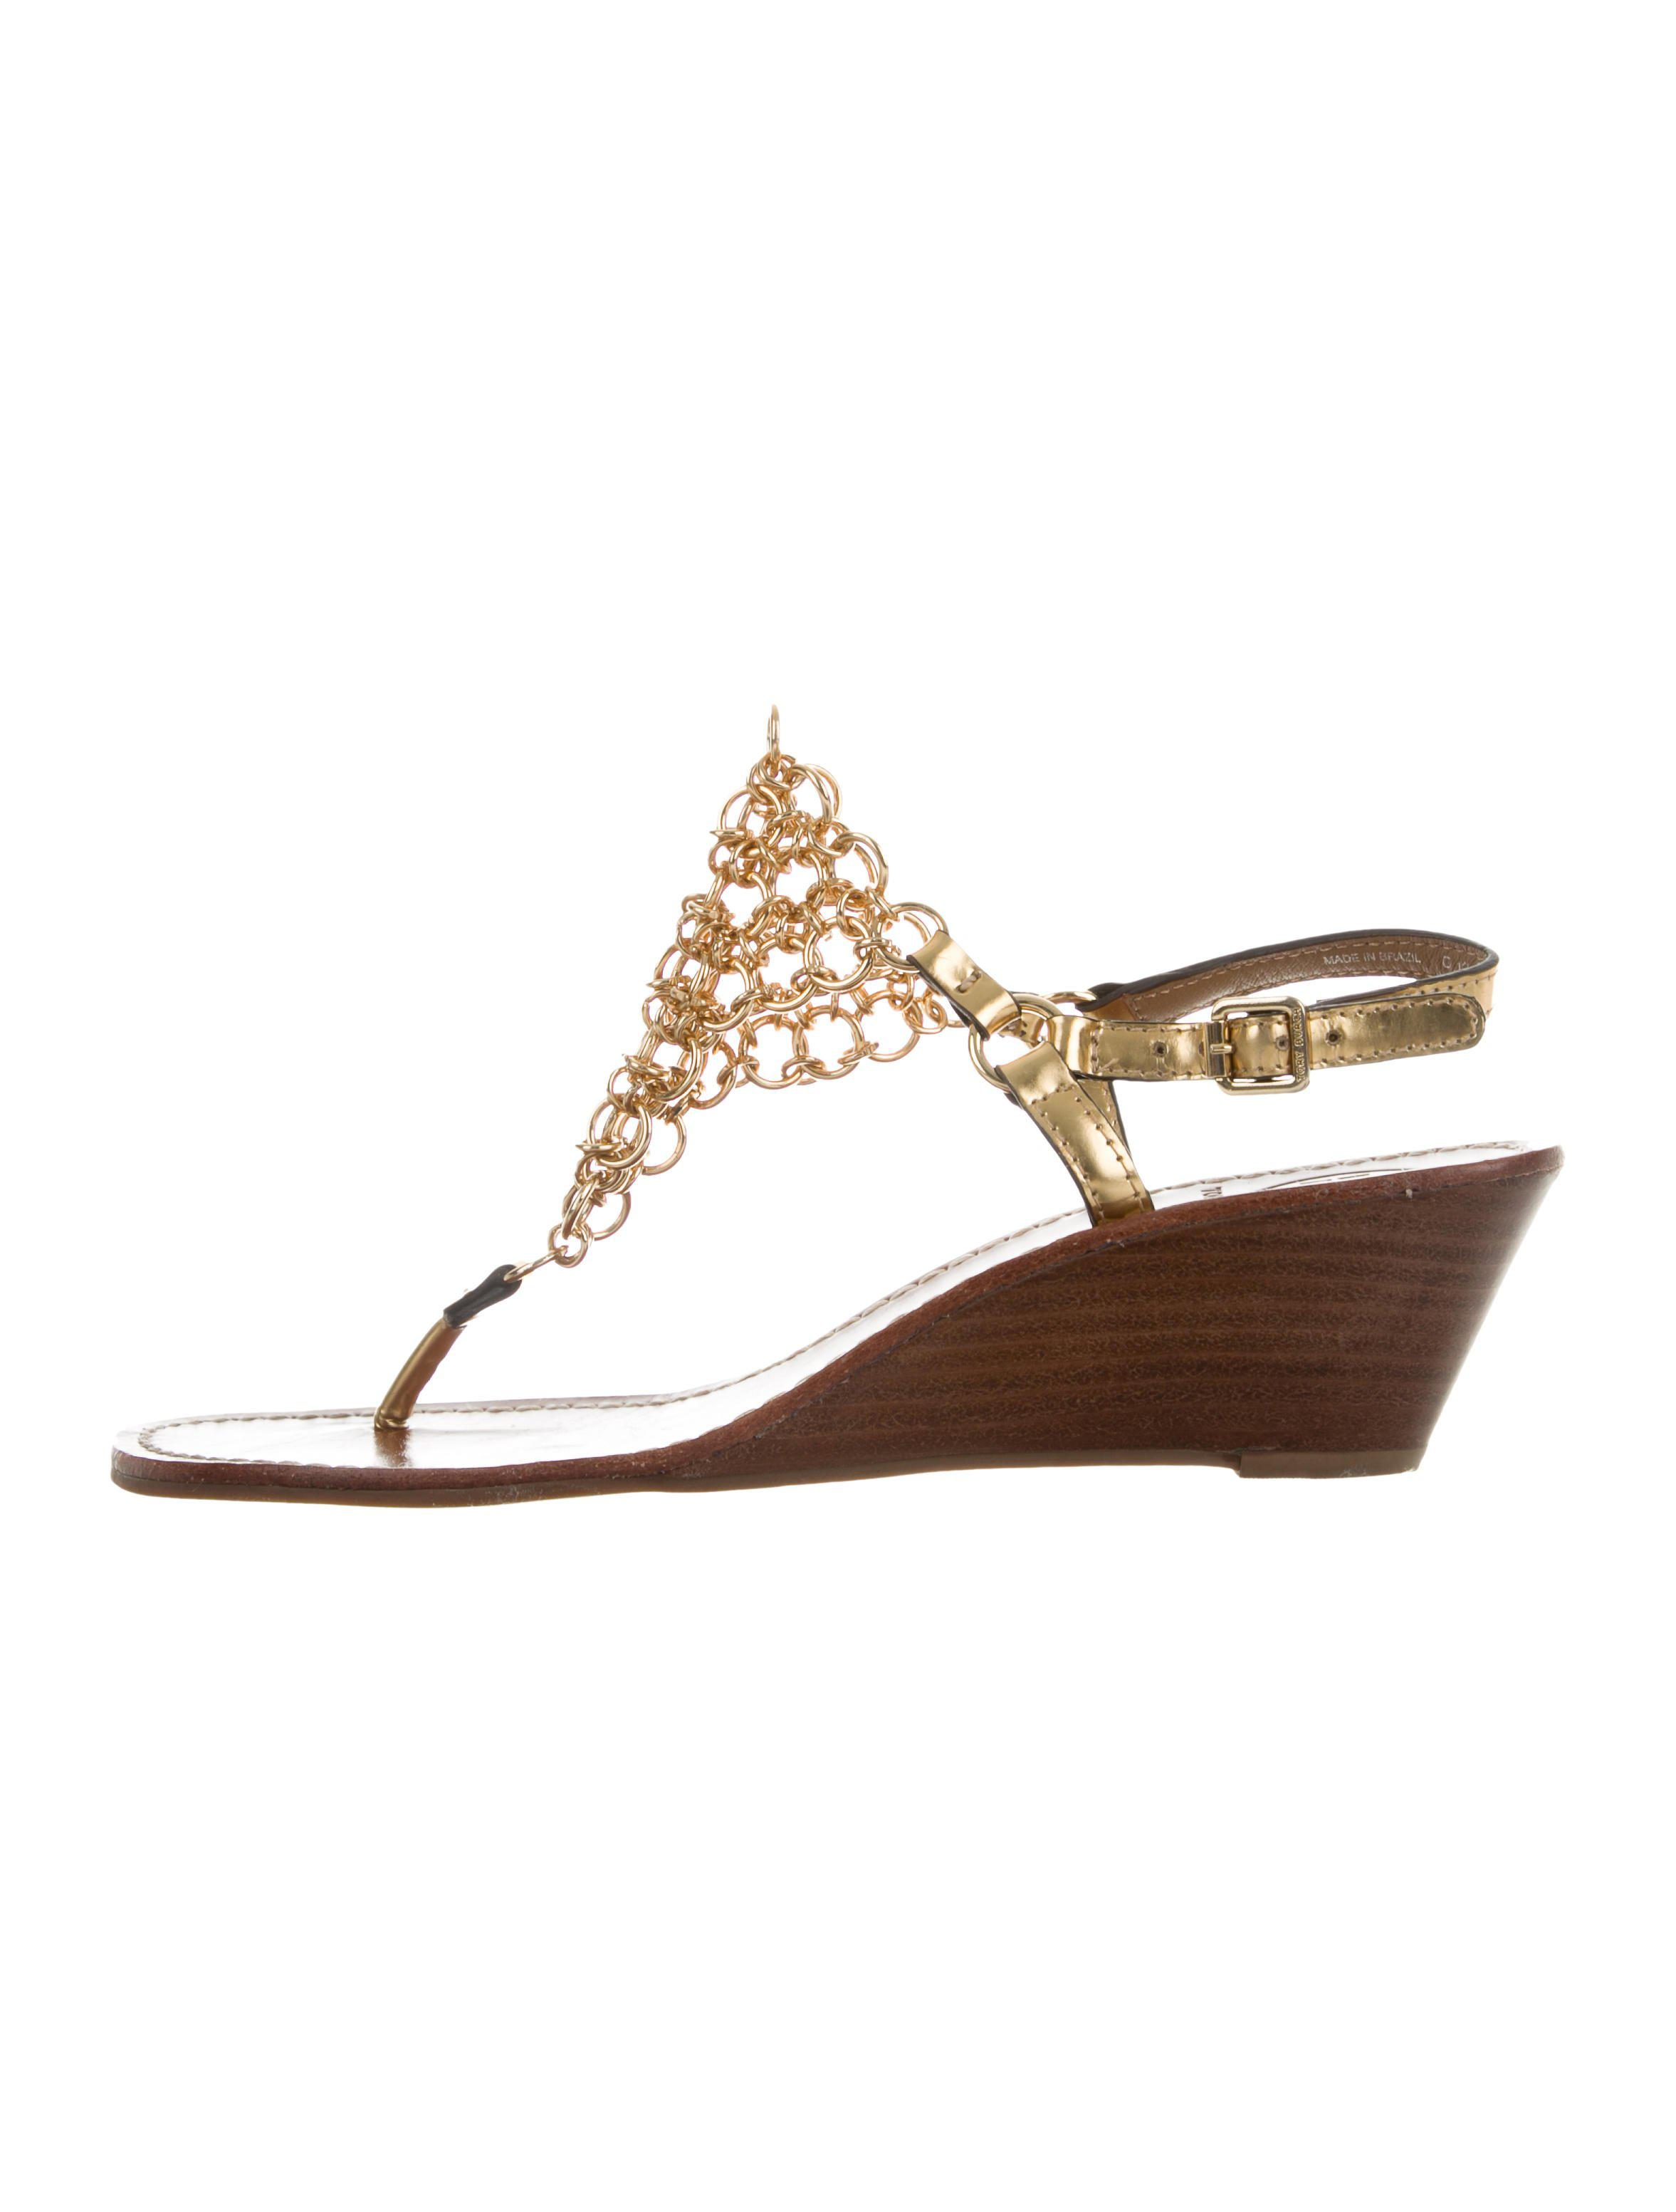 de34b2b3709fb Lyst - Tory Burch Chain-link Wedge Sandals in Metallic